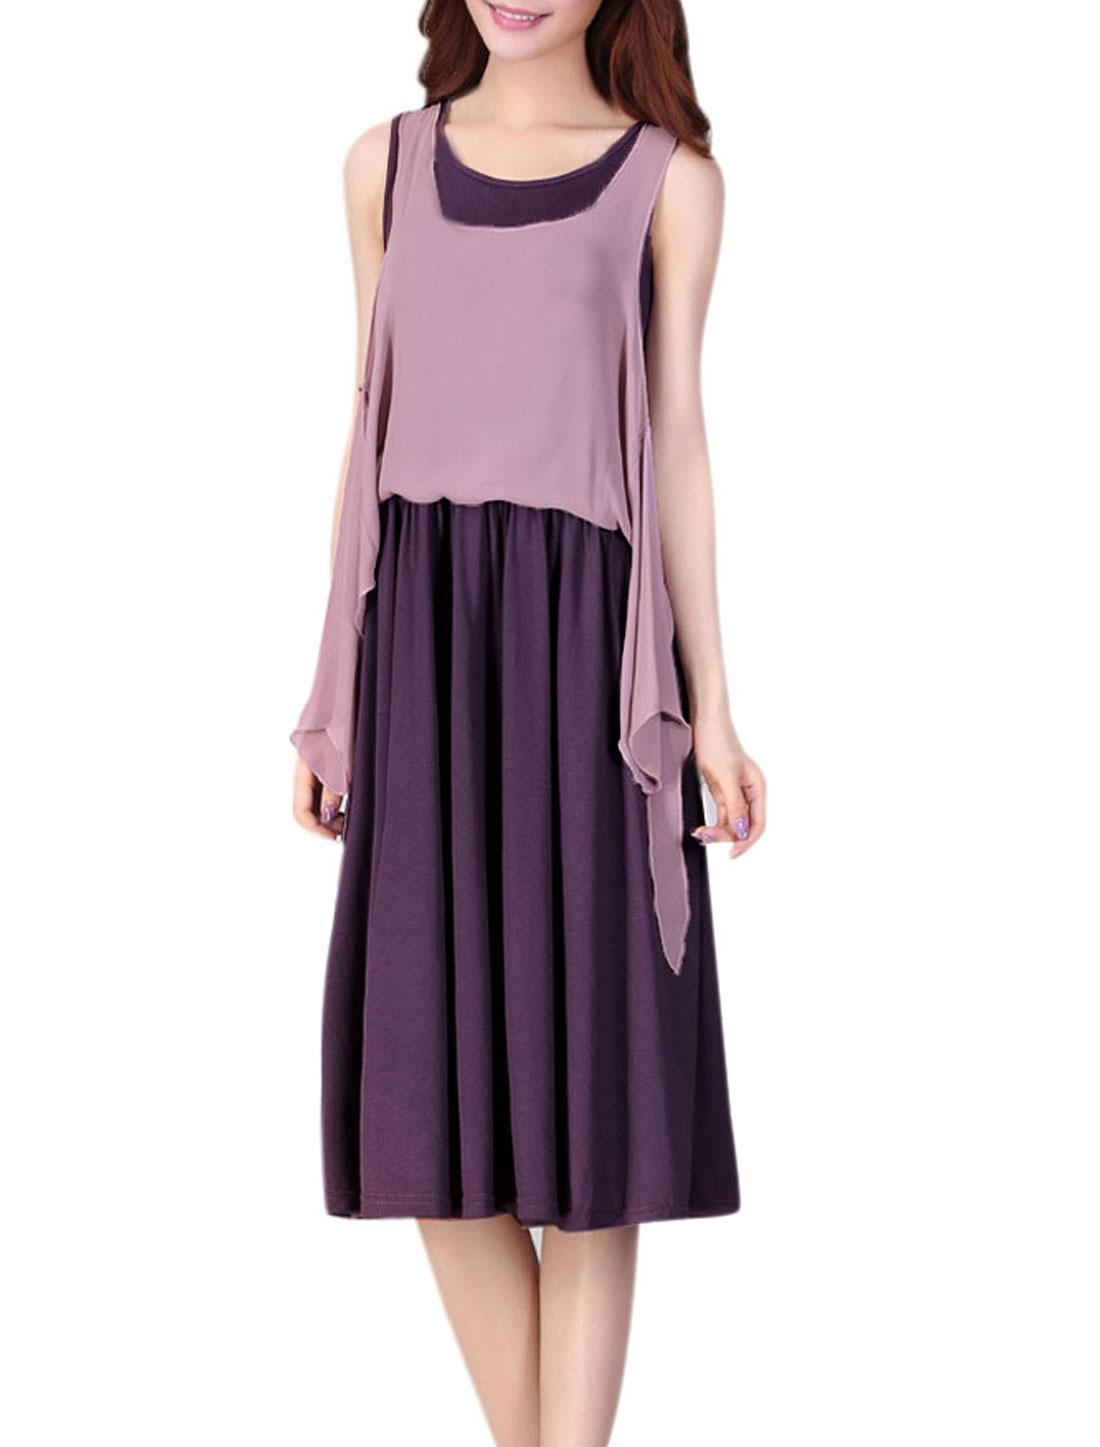 Lady Fashion Sleeveless Chiffon Splice Design Tank Dress Dark Purple XS